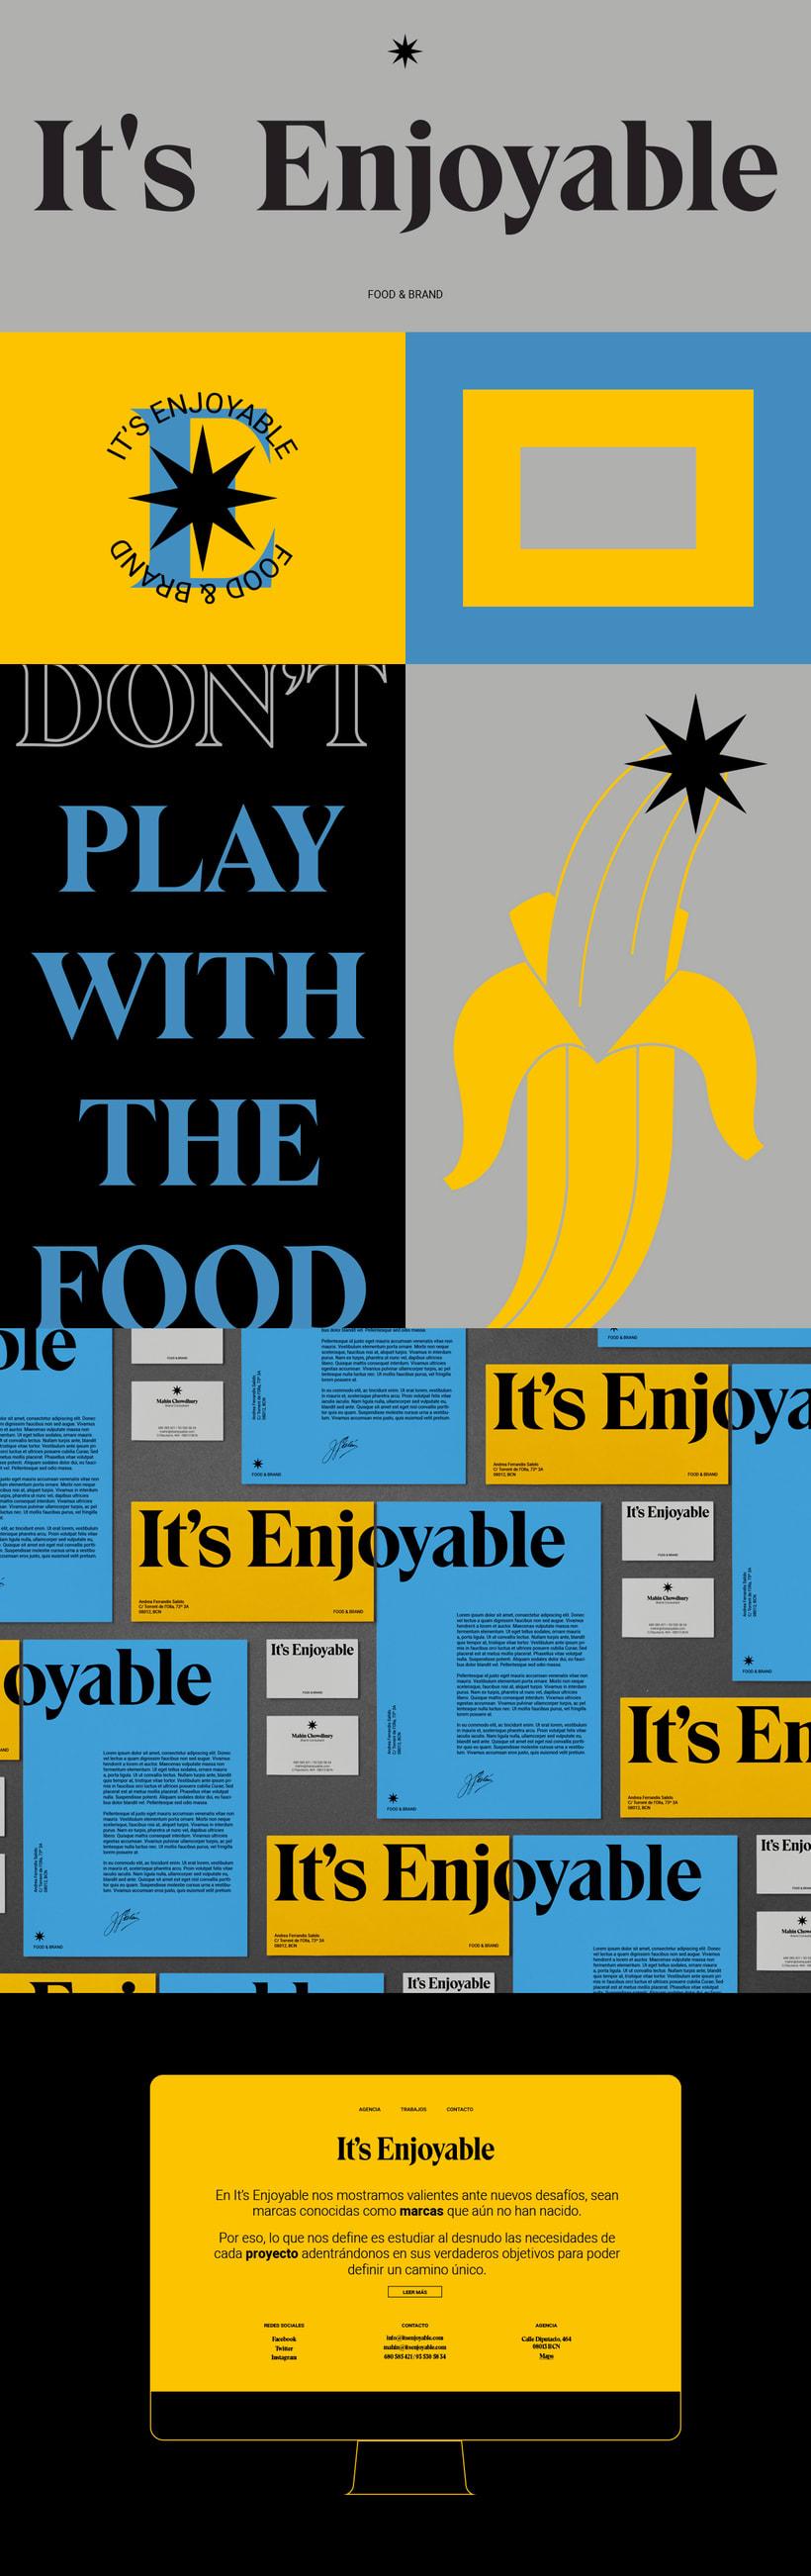 It's Enjoyable -1